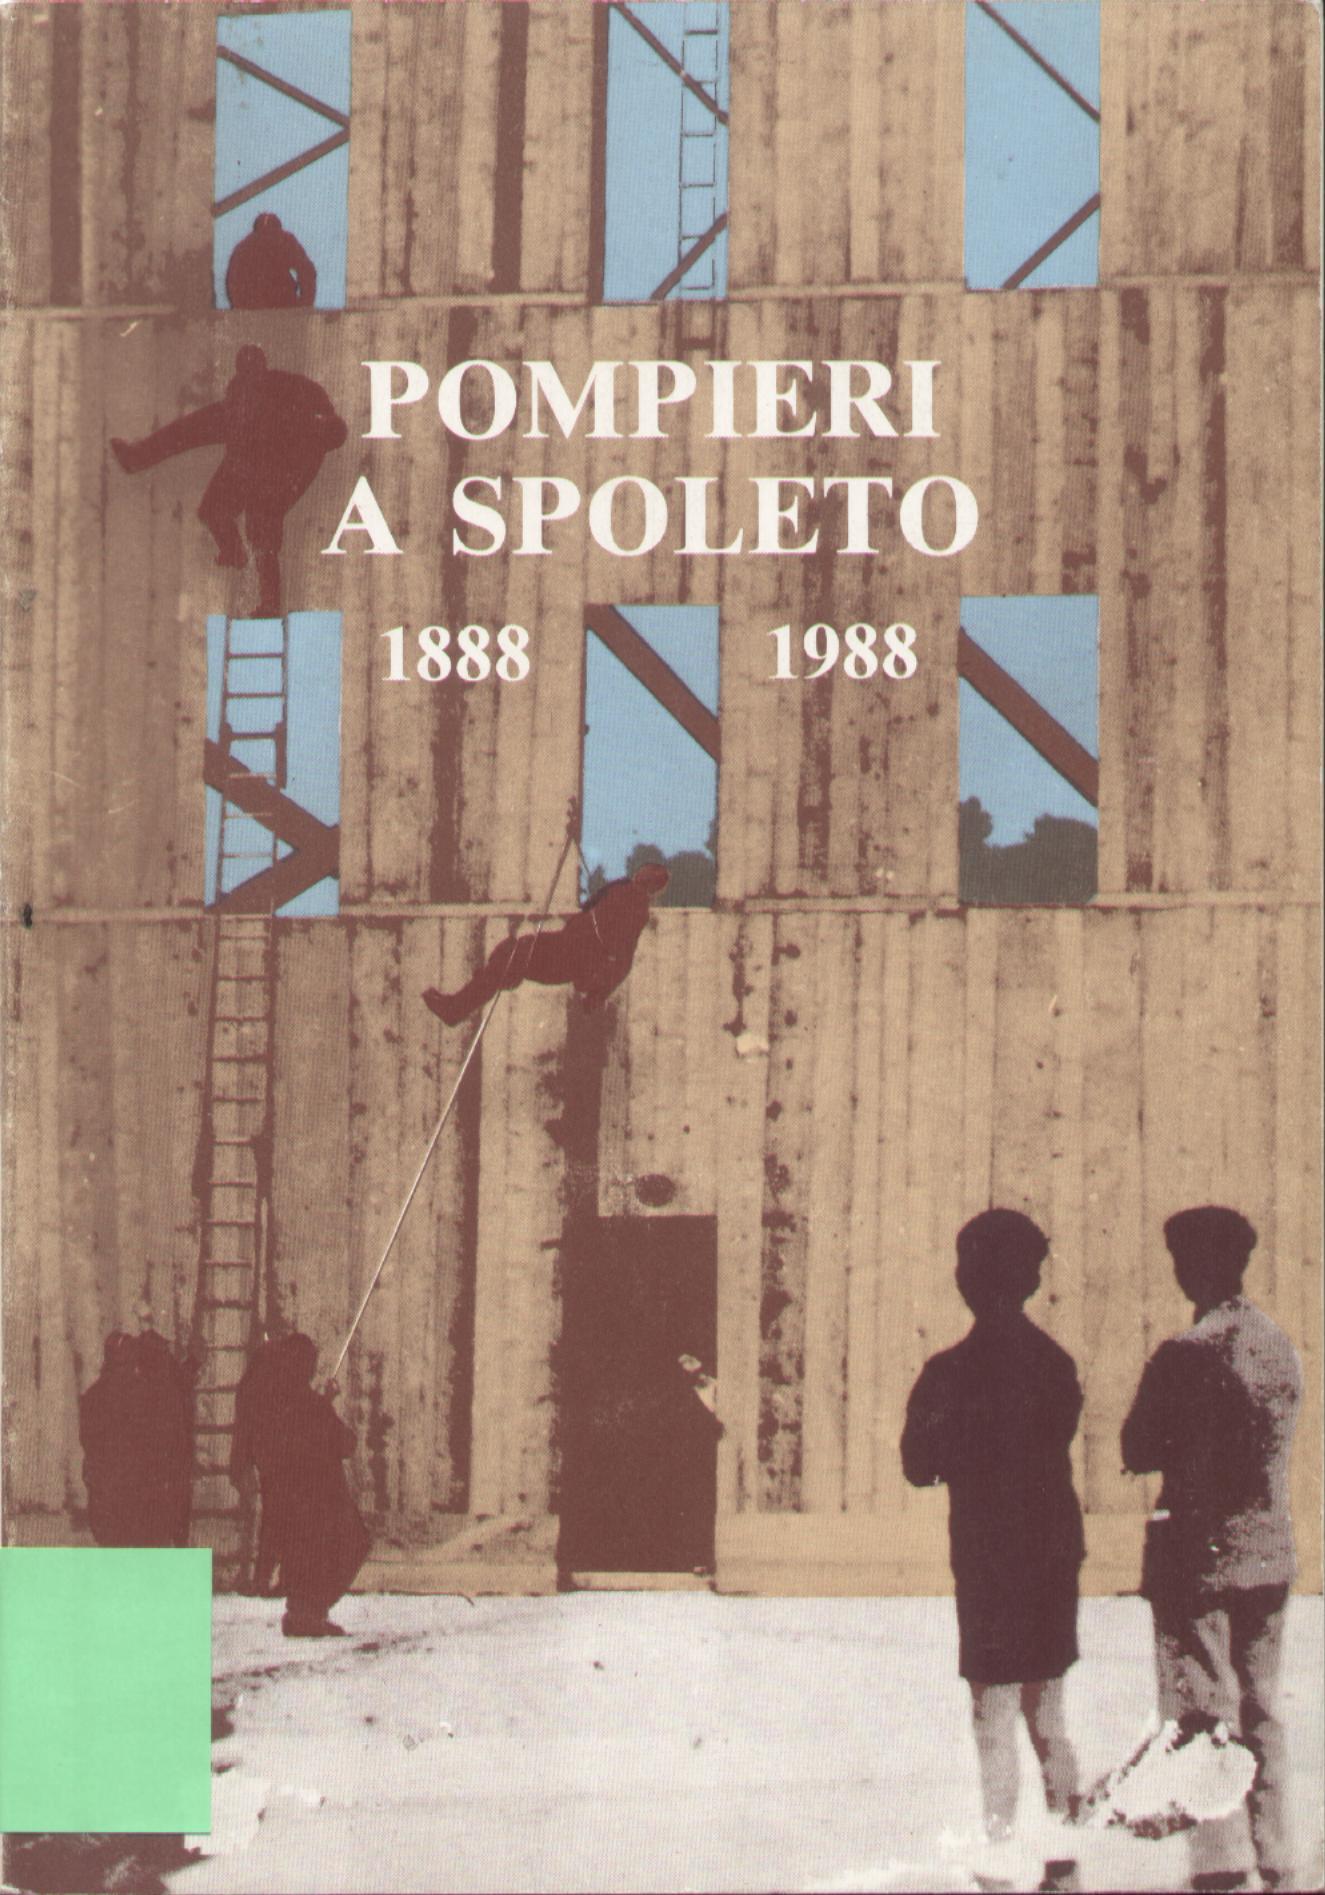 Pompieri a Spoleto 1888 - 1988